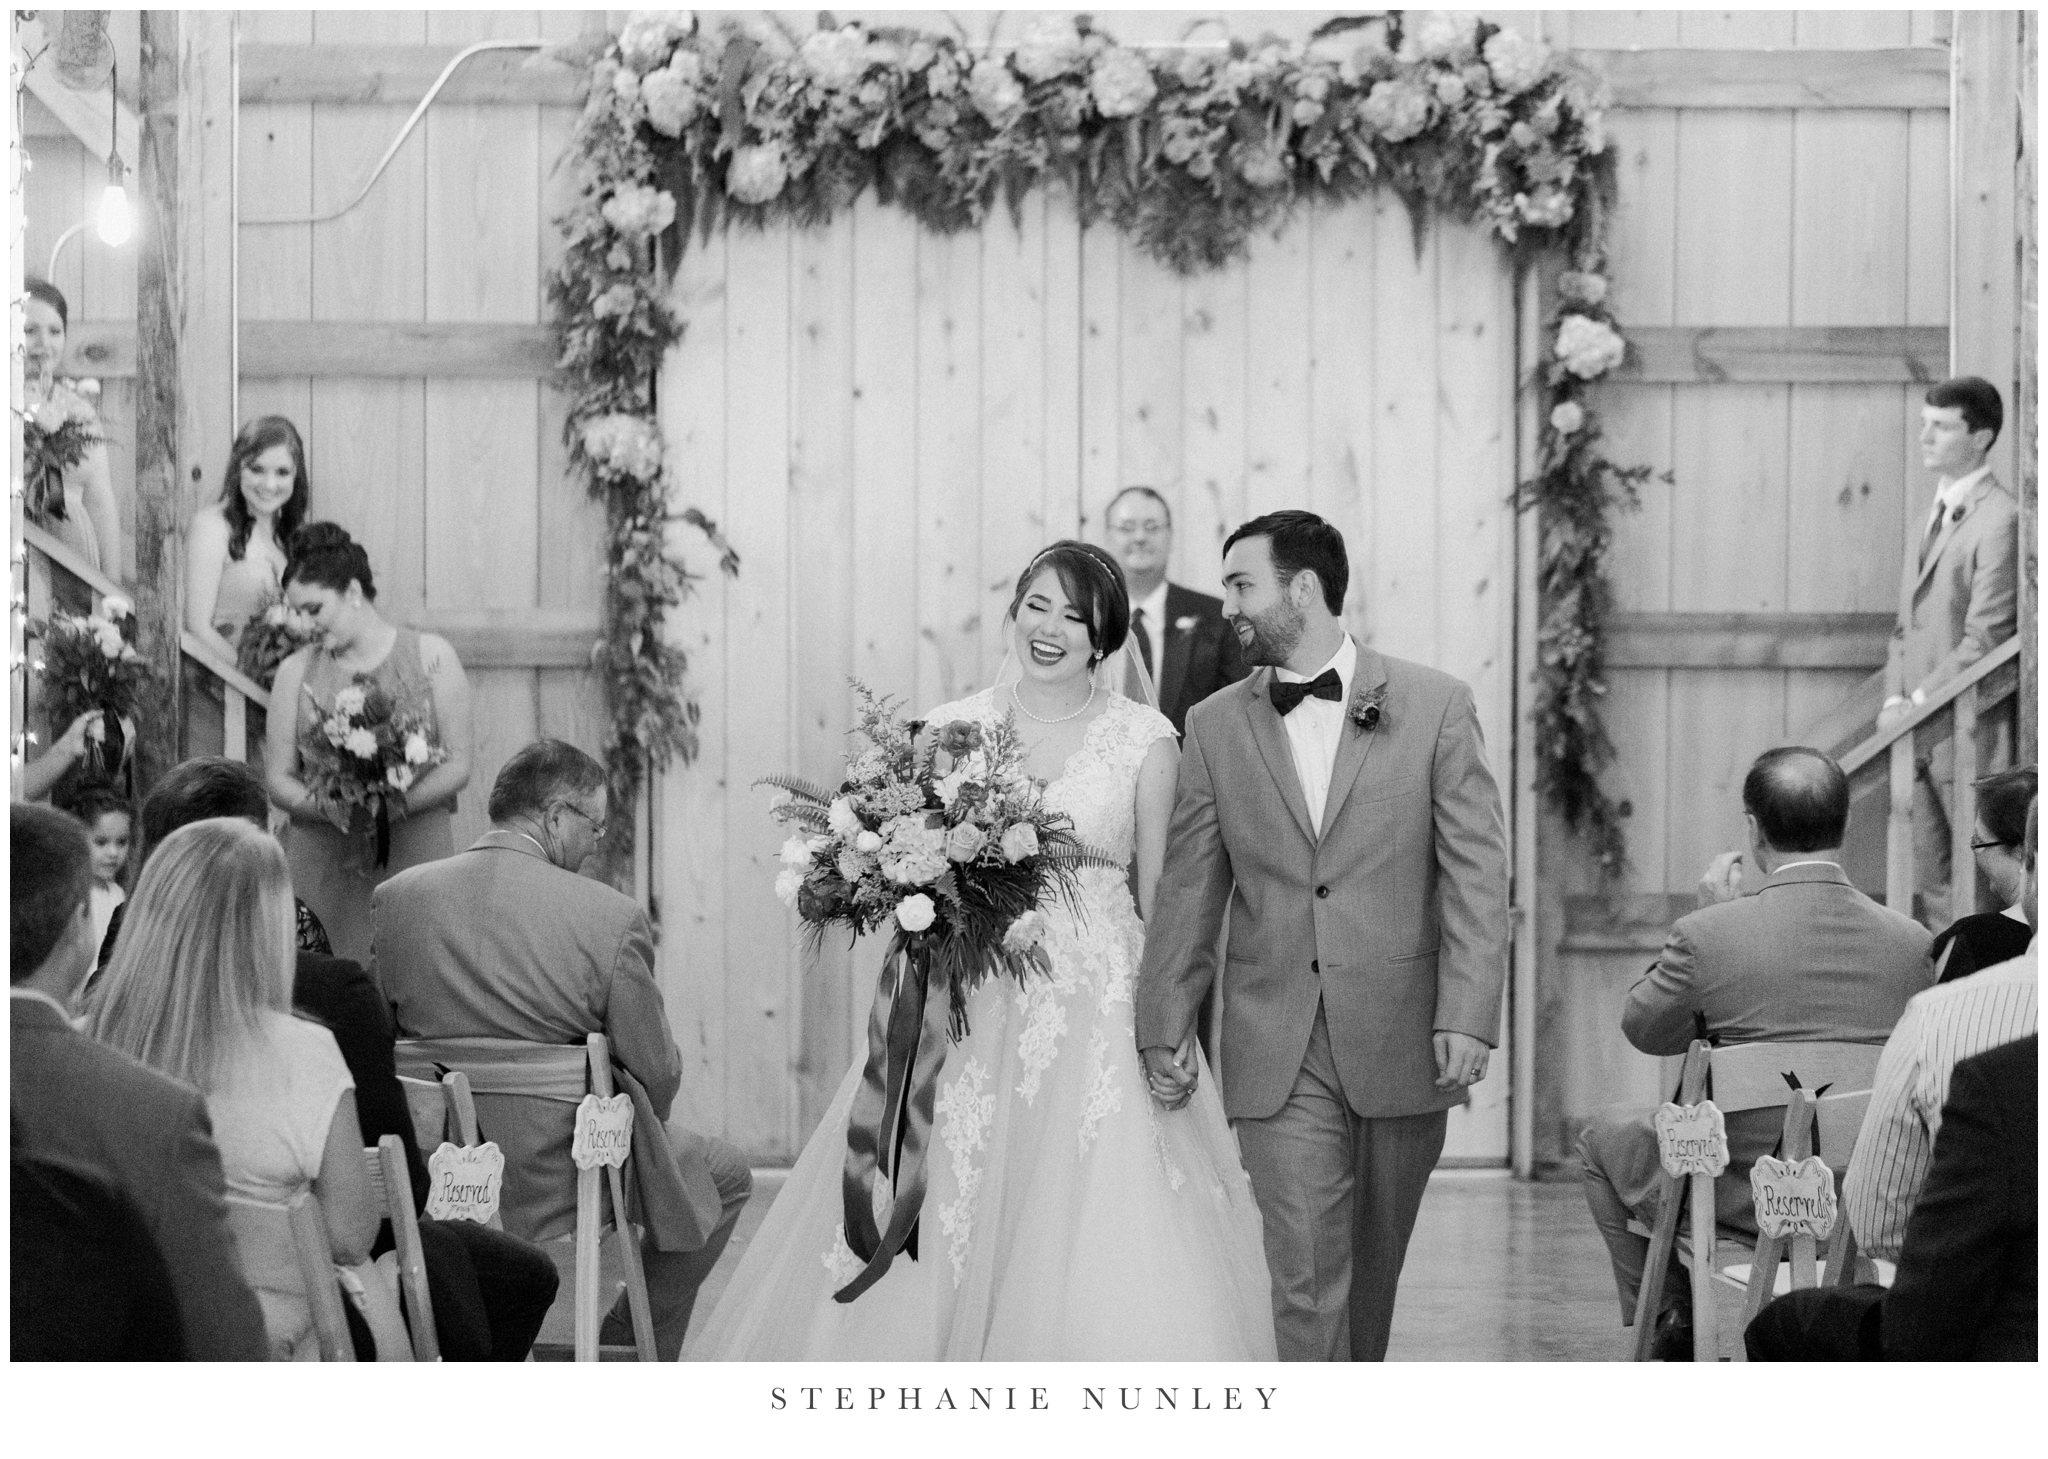 arkansas-wedding-with-lush-wildflower-bouquet-0104.jpg